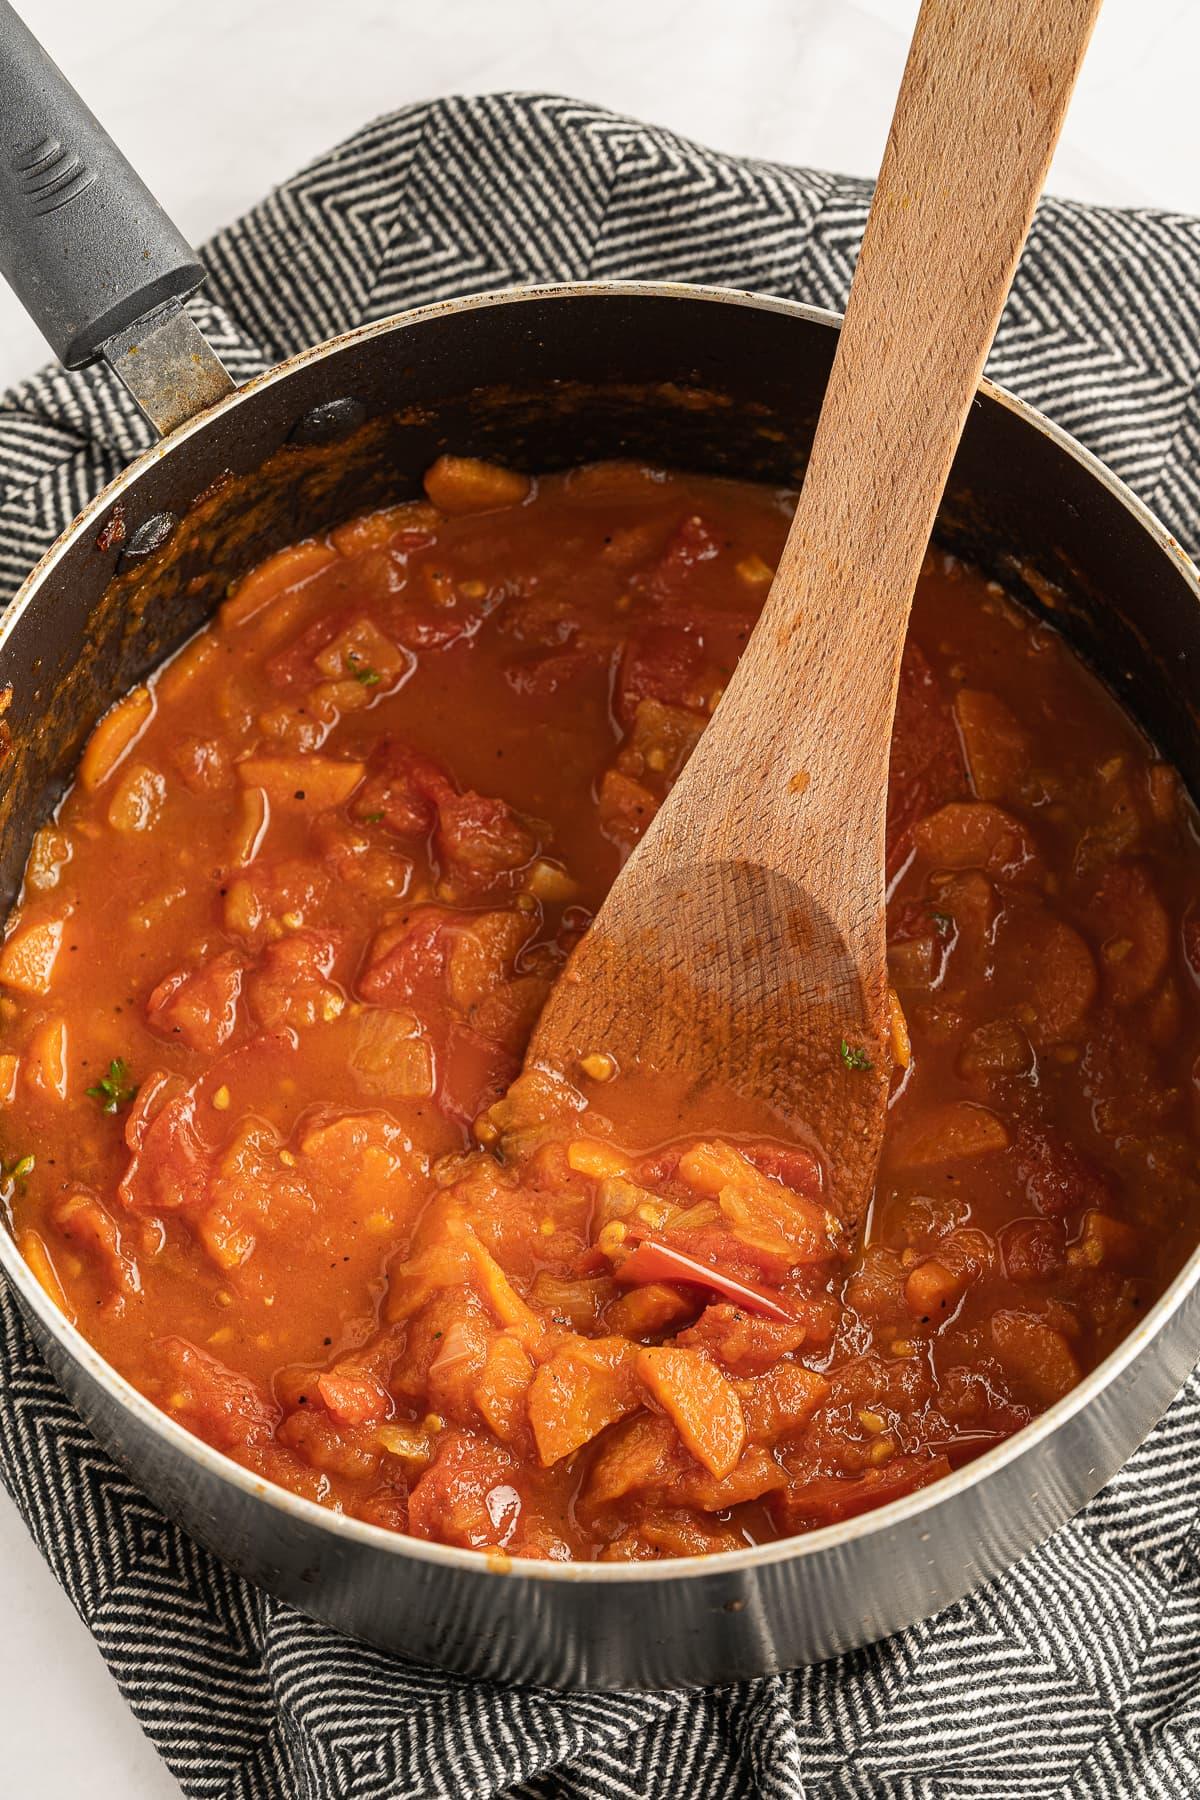 Gluten free tomato basil soup